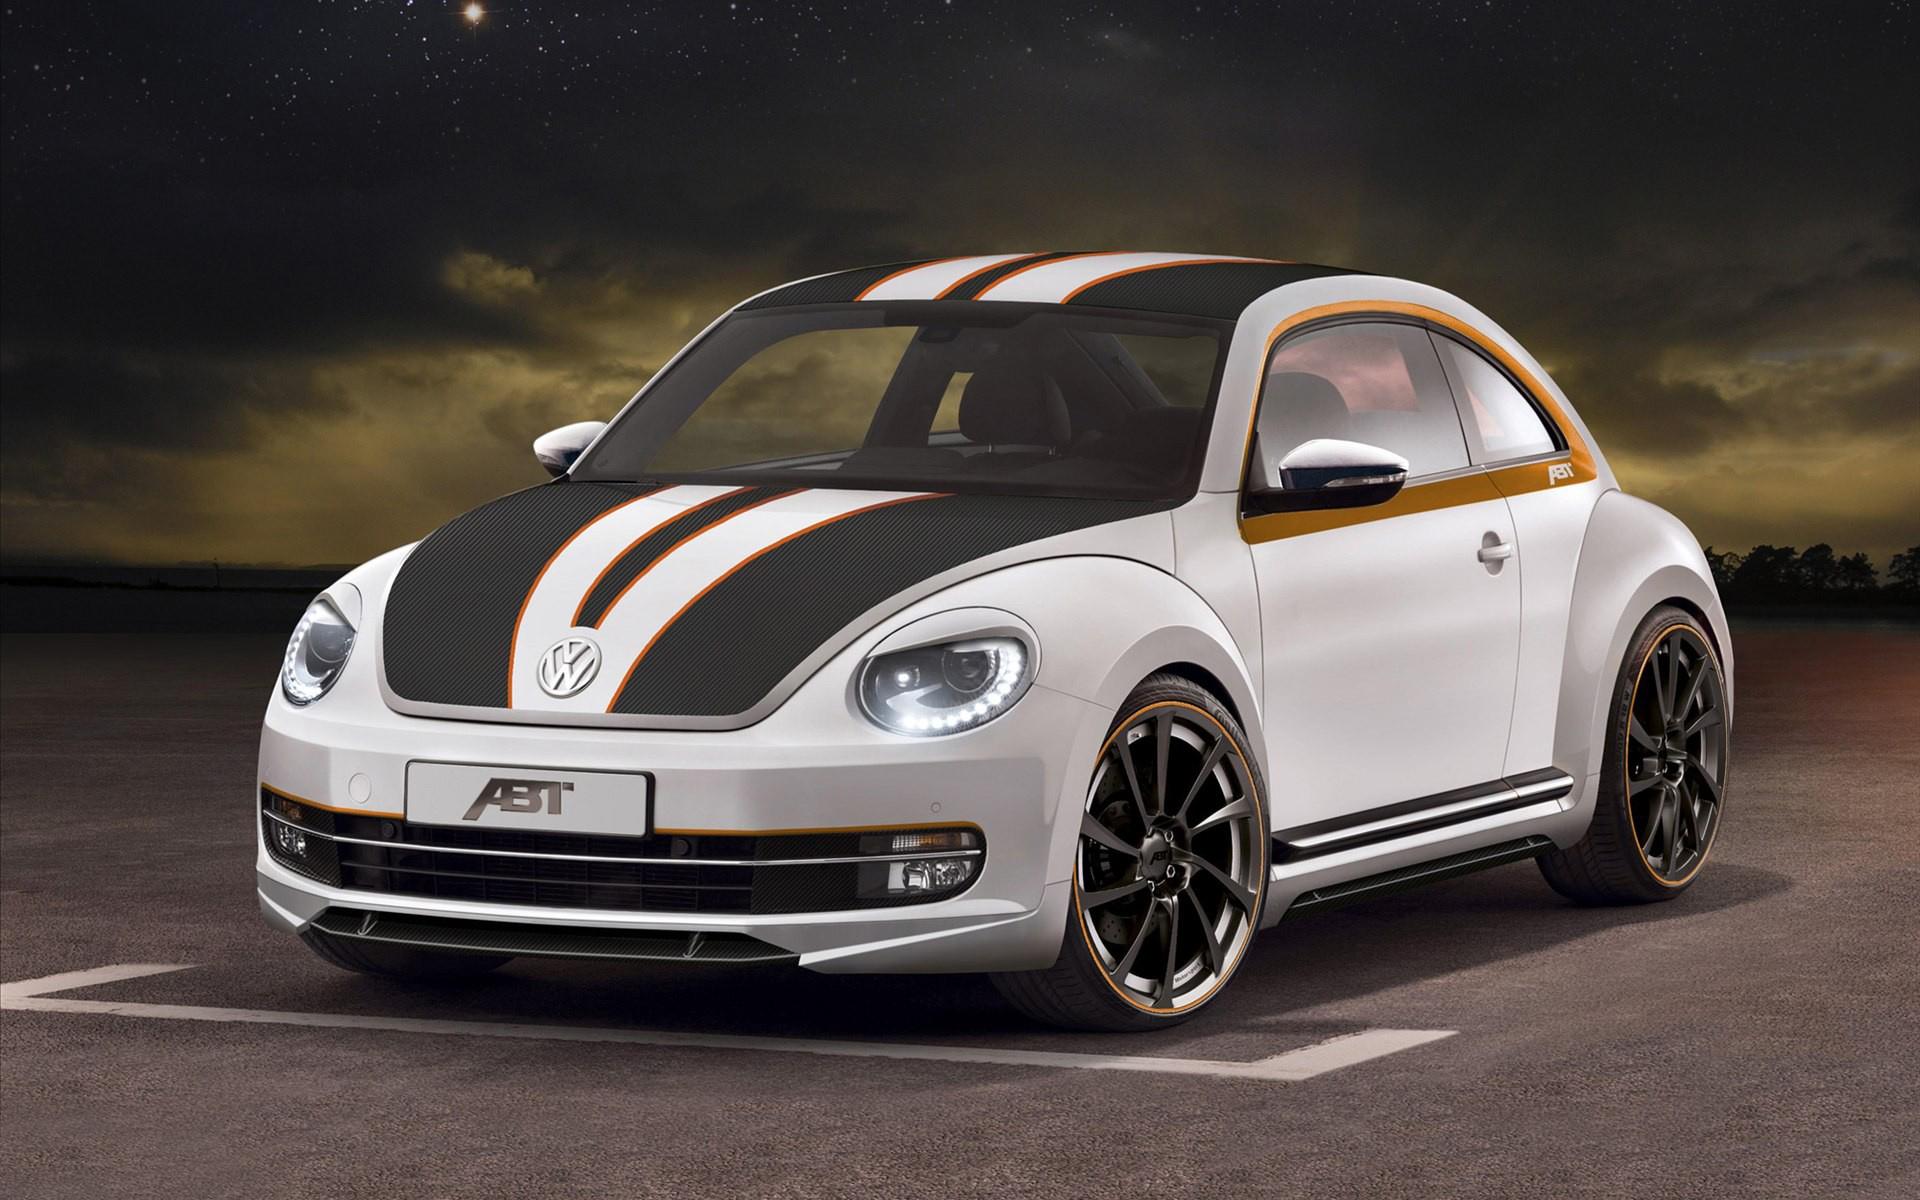 abt sportsline volkswagen beetle 2012 wallpaper hd car wallpapers id 2700. Black Bedroom Furniture Sets. Home Design Ideas